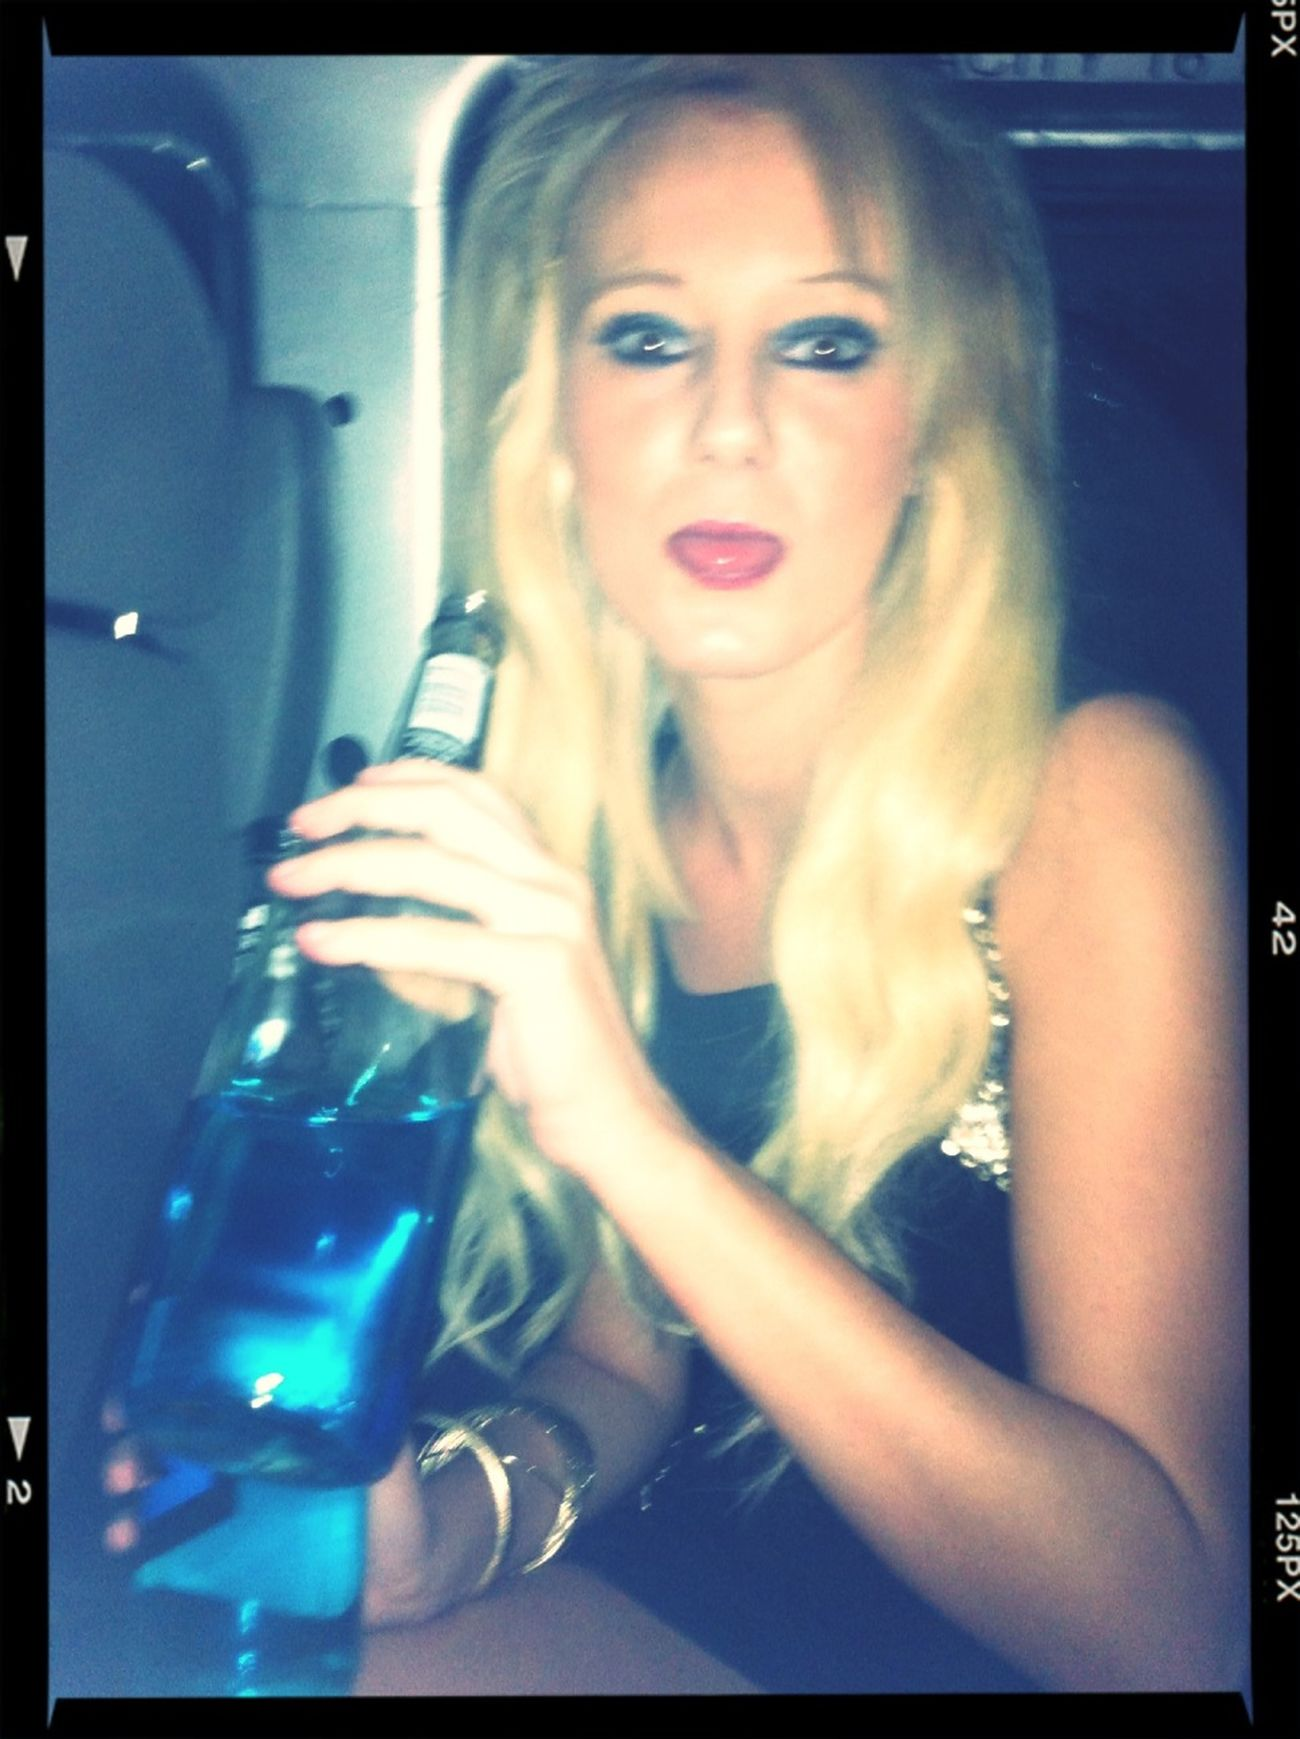 Boozing